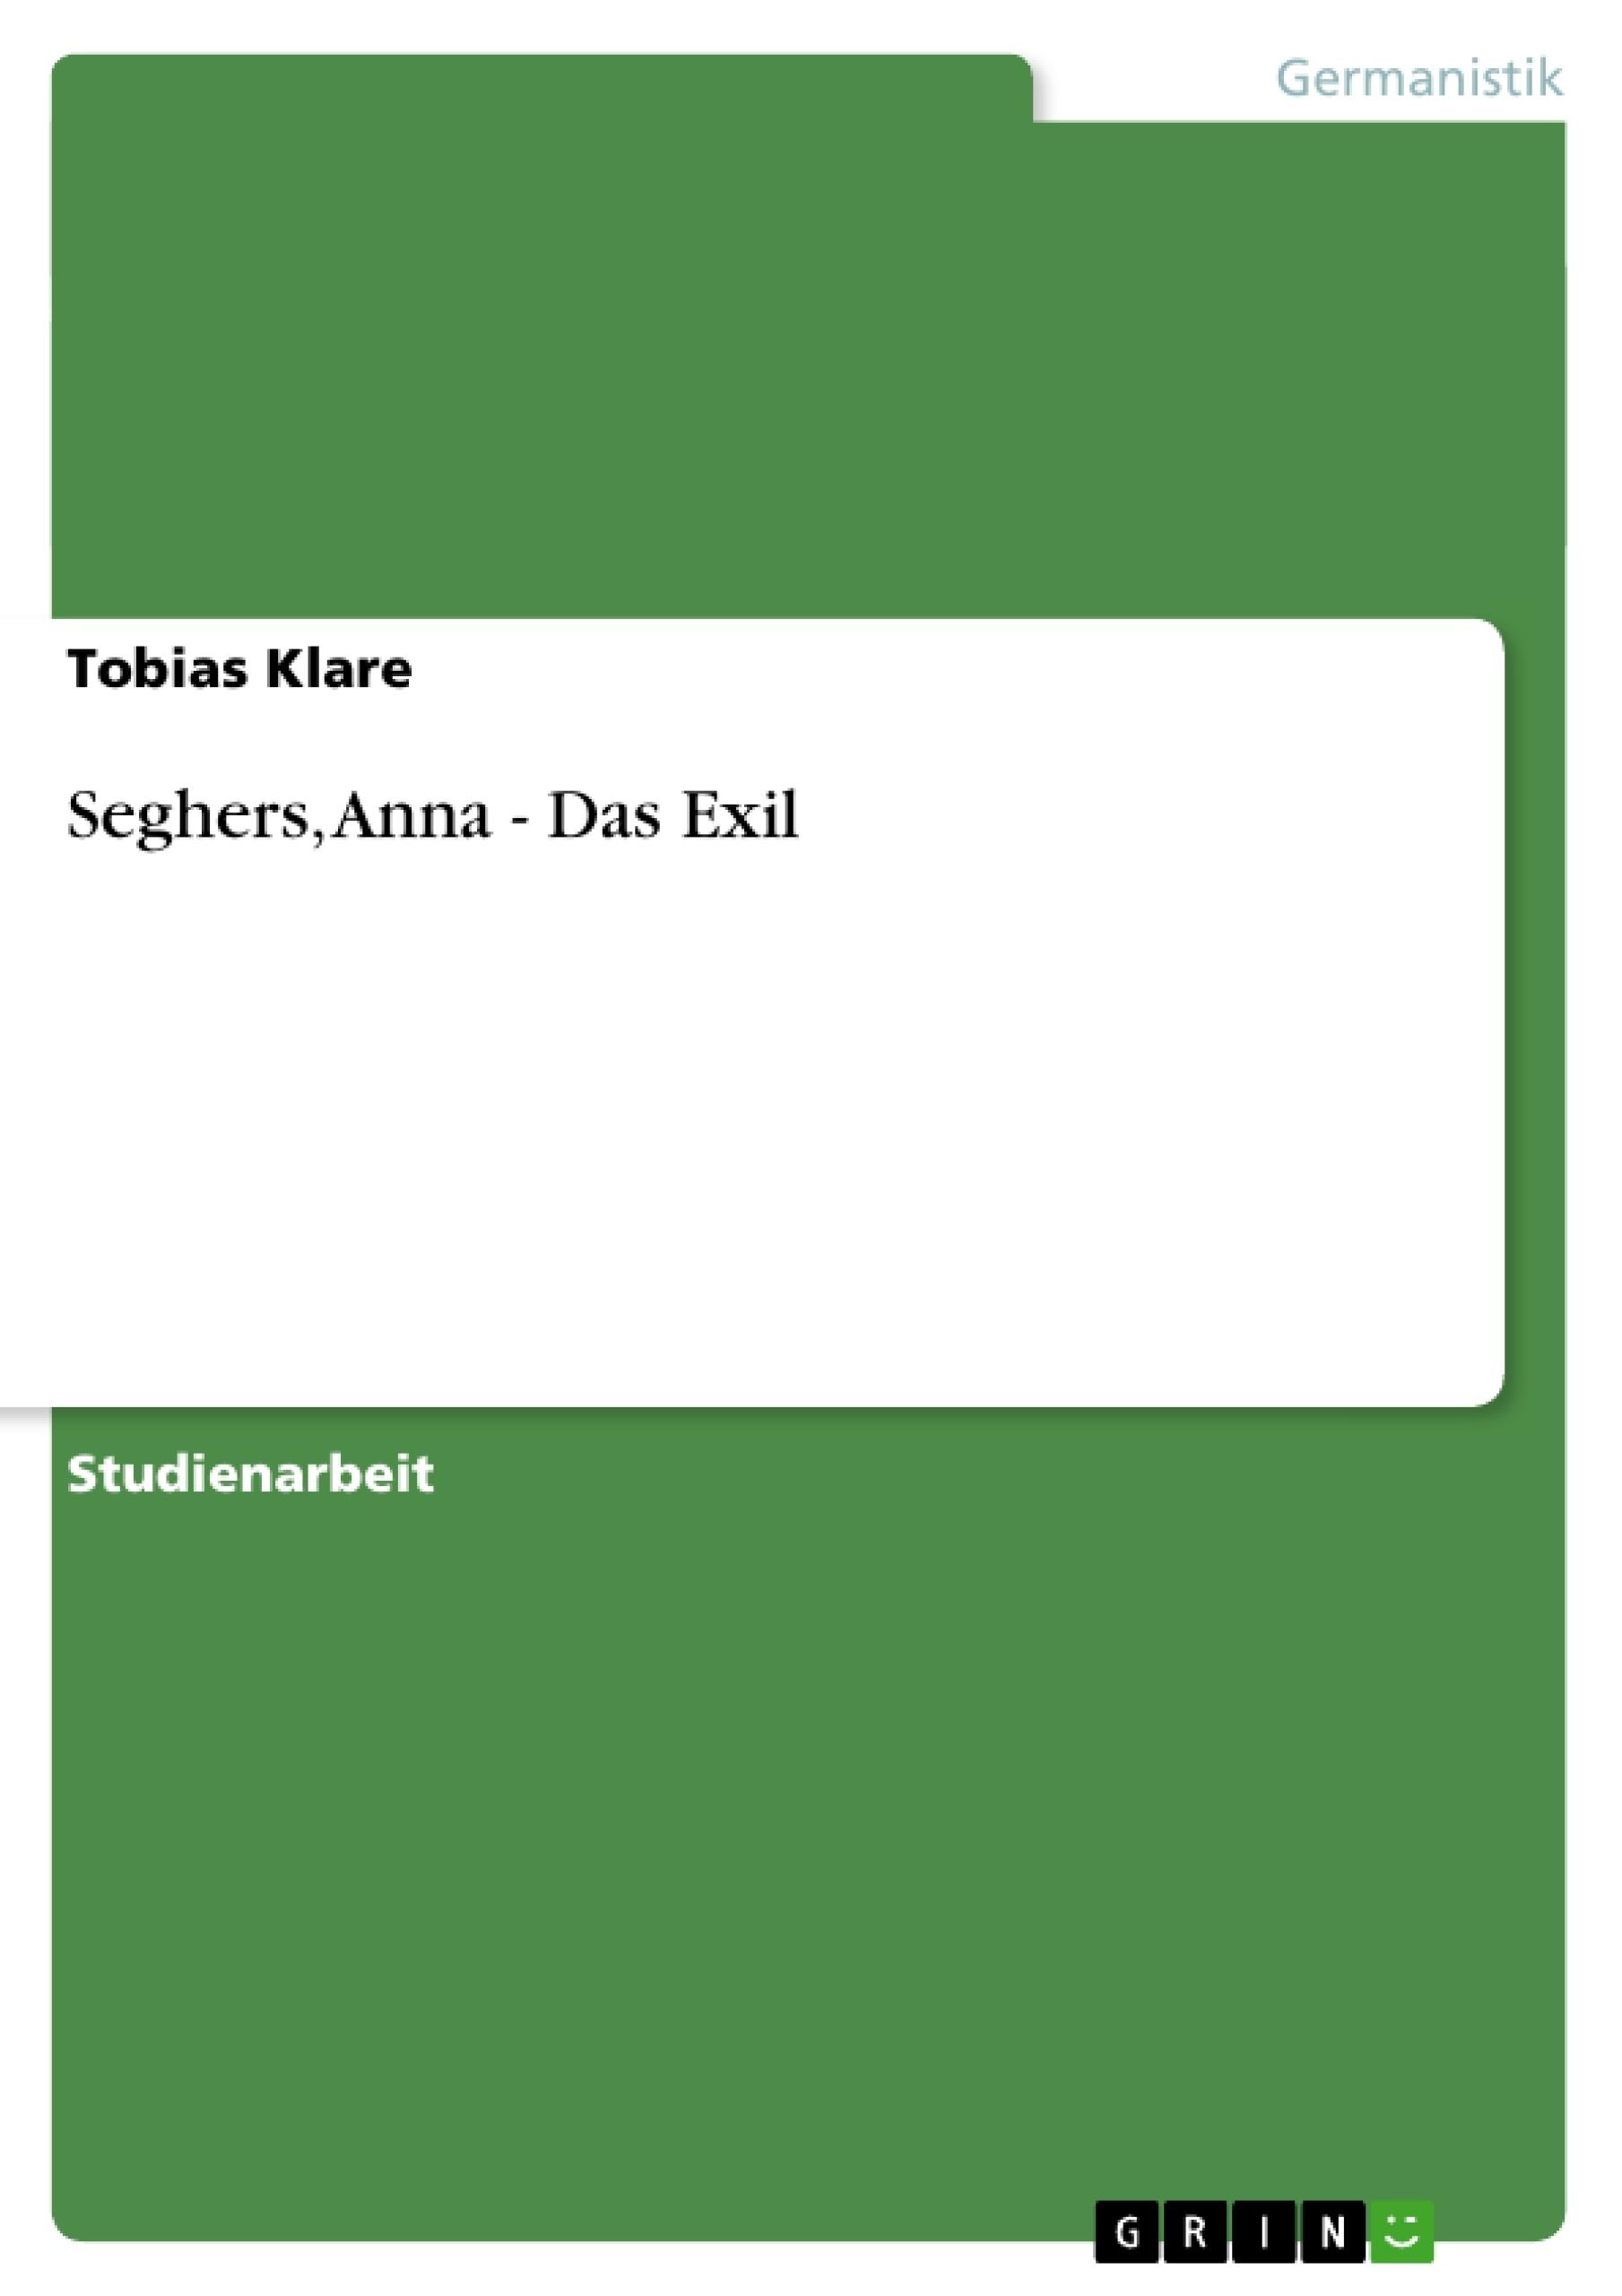 Titel: Seghers, Anna - Das Exil